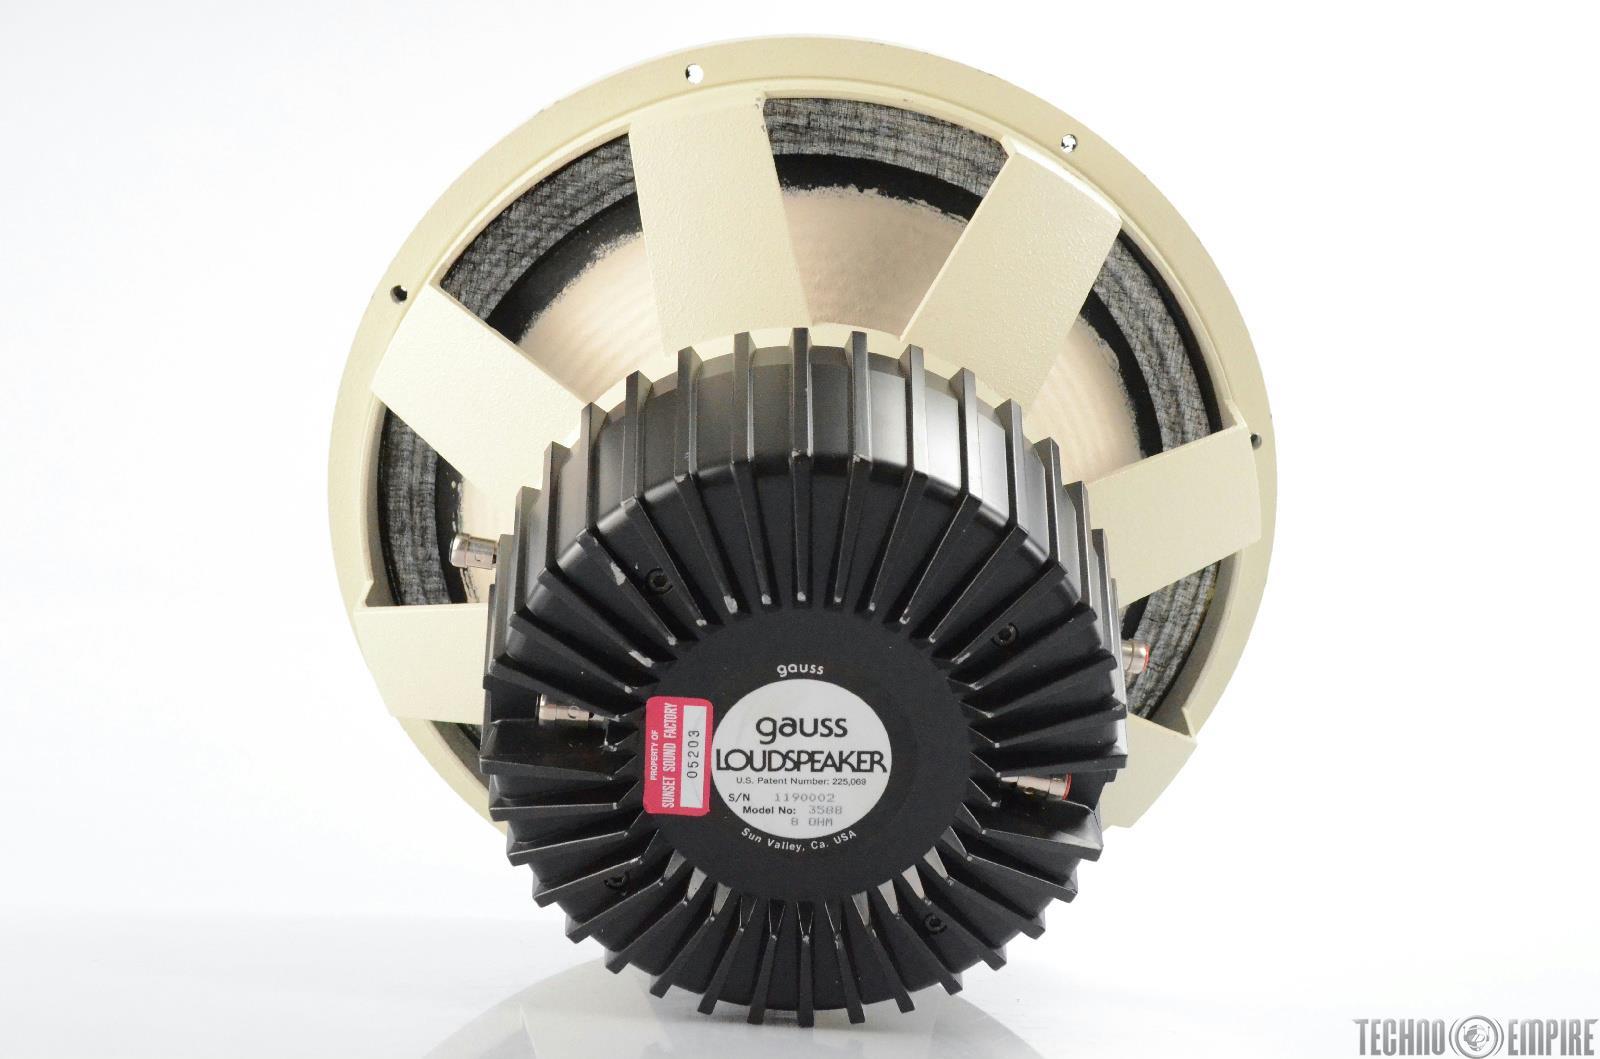 "Gauss 3588 15"" Coaxial Loudspeaker Speaker from Sunset Sound Factory #30596"